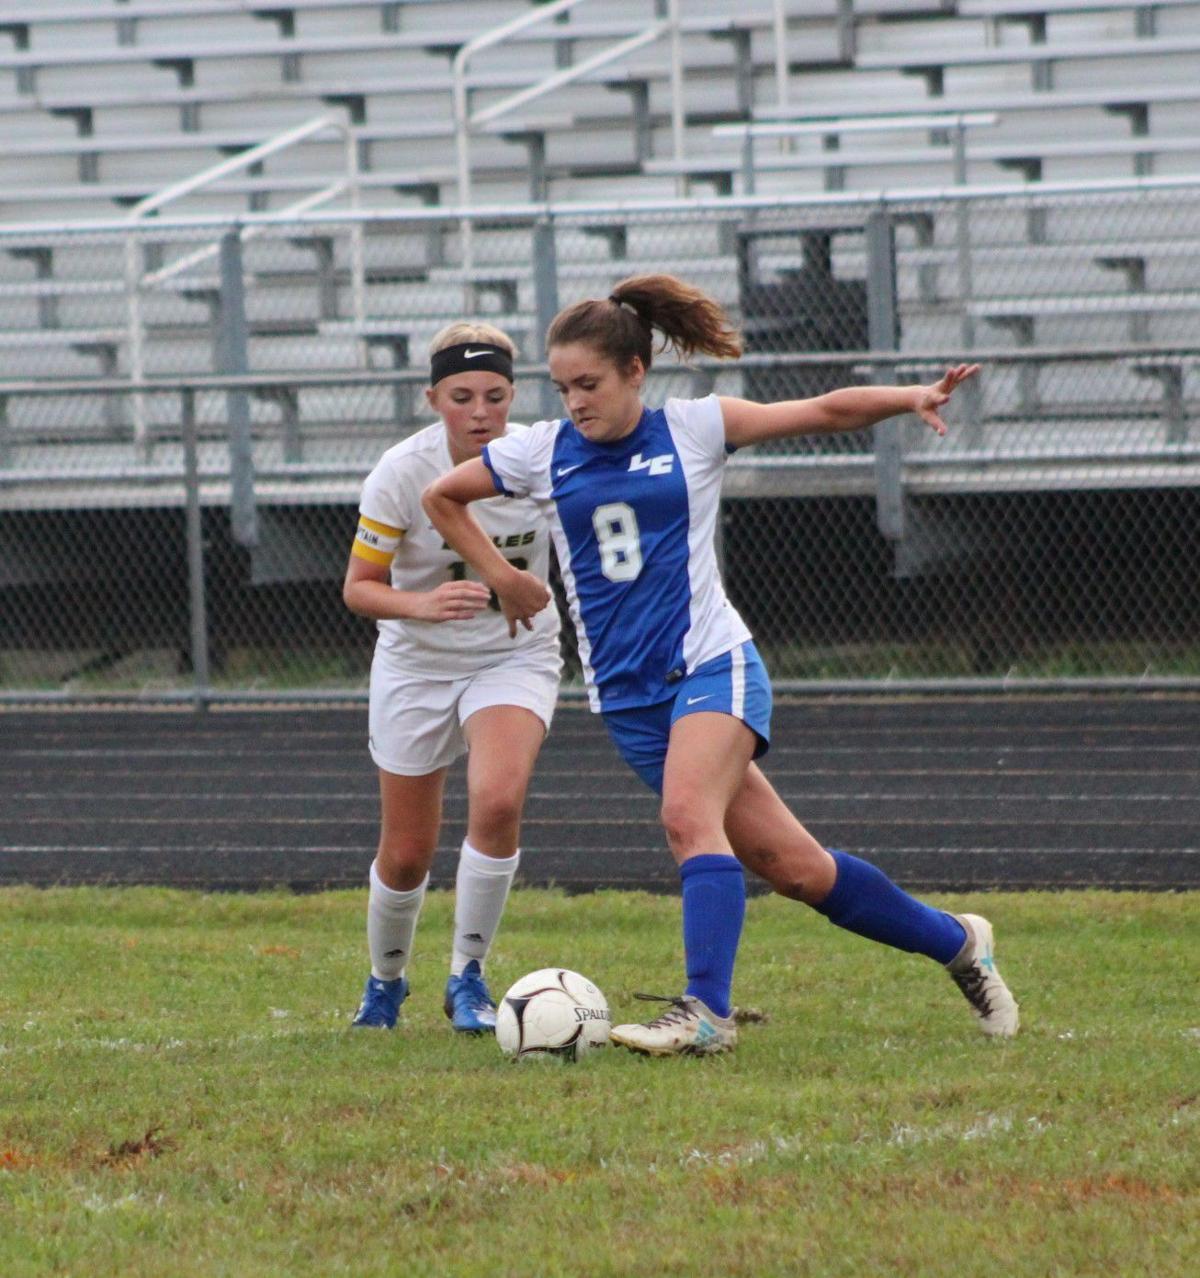 Mackenzie Hendricks: Second Team All State